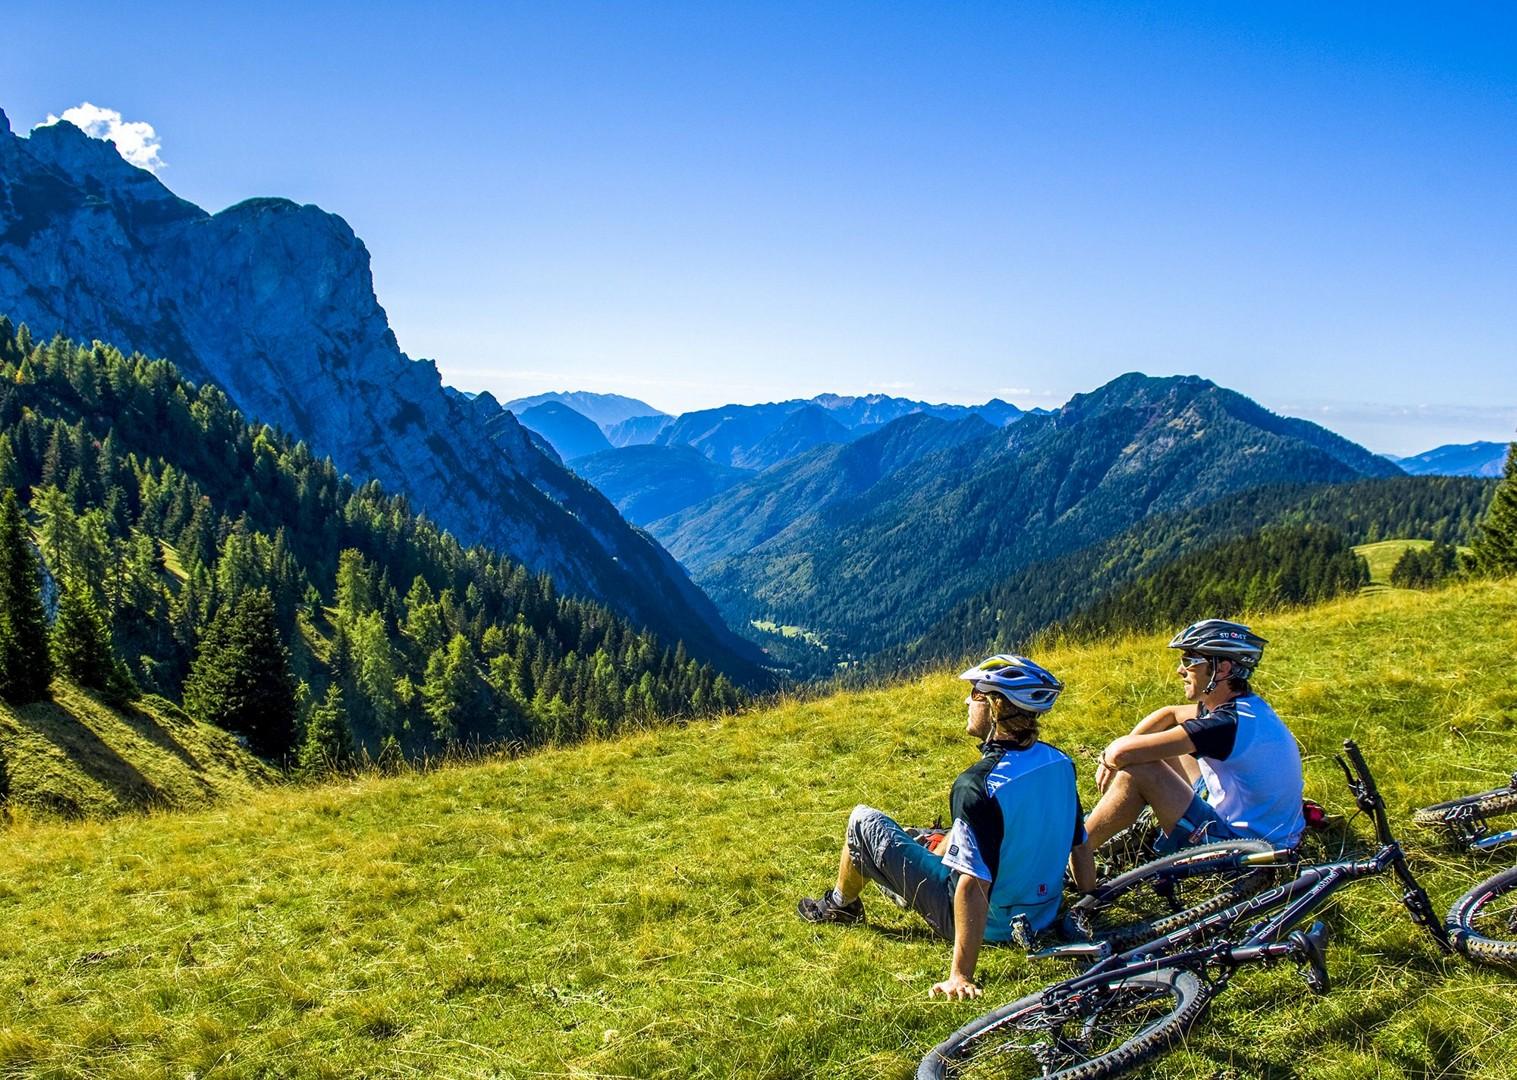 Brenta_Bike_2007_066-2.jpg - Italy - Dolomites of Brenta - Guided Mountain Bike Holiday - Italia Mountain Biking